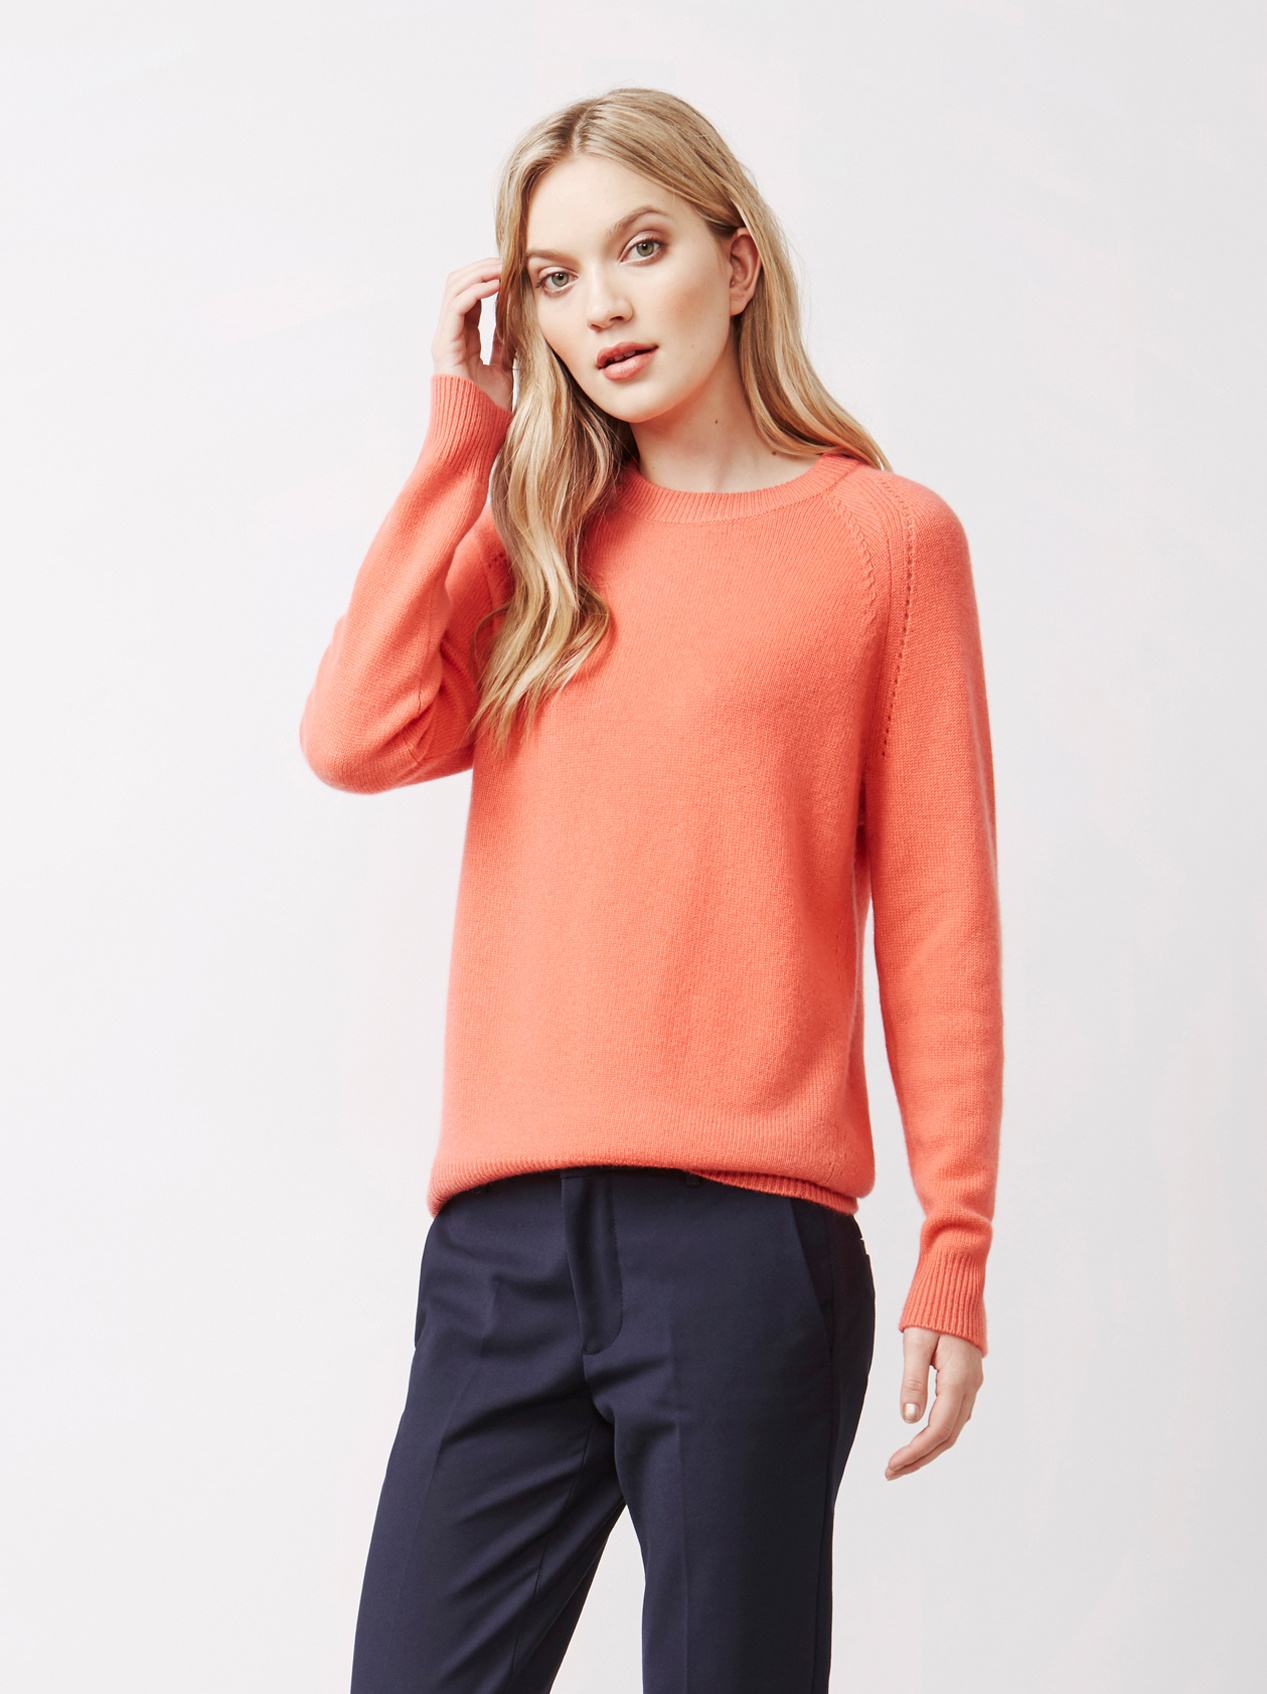 Soft Goat Women's Soft Sweater Tropicana